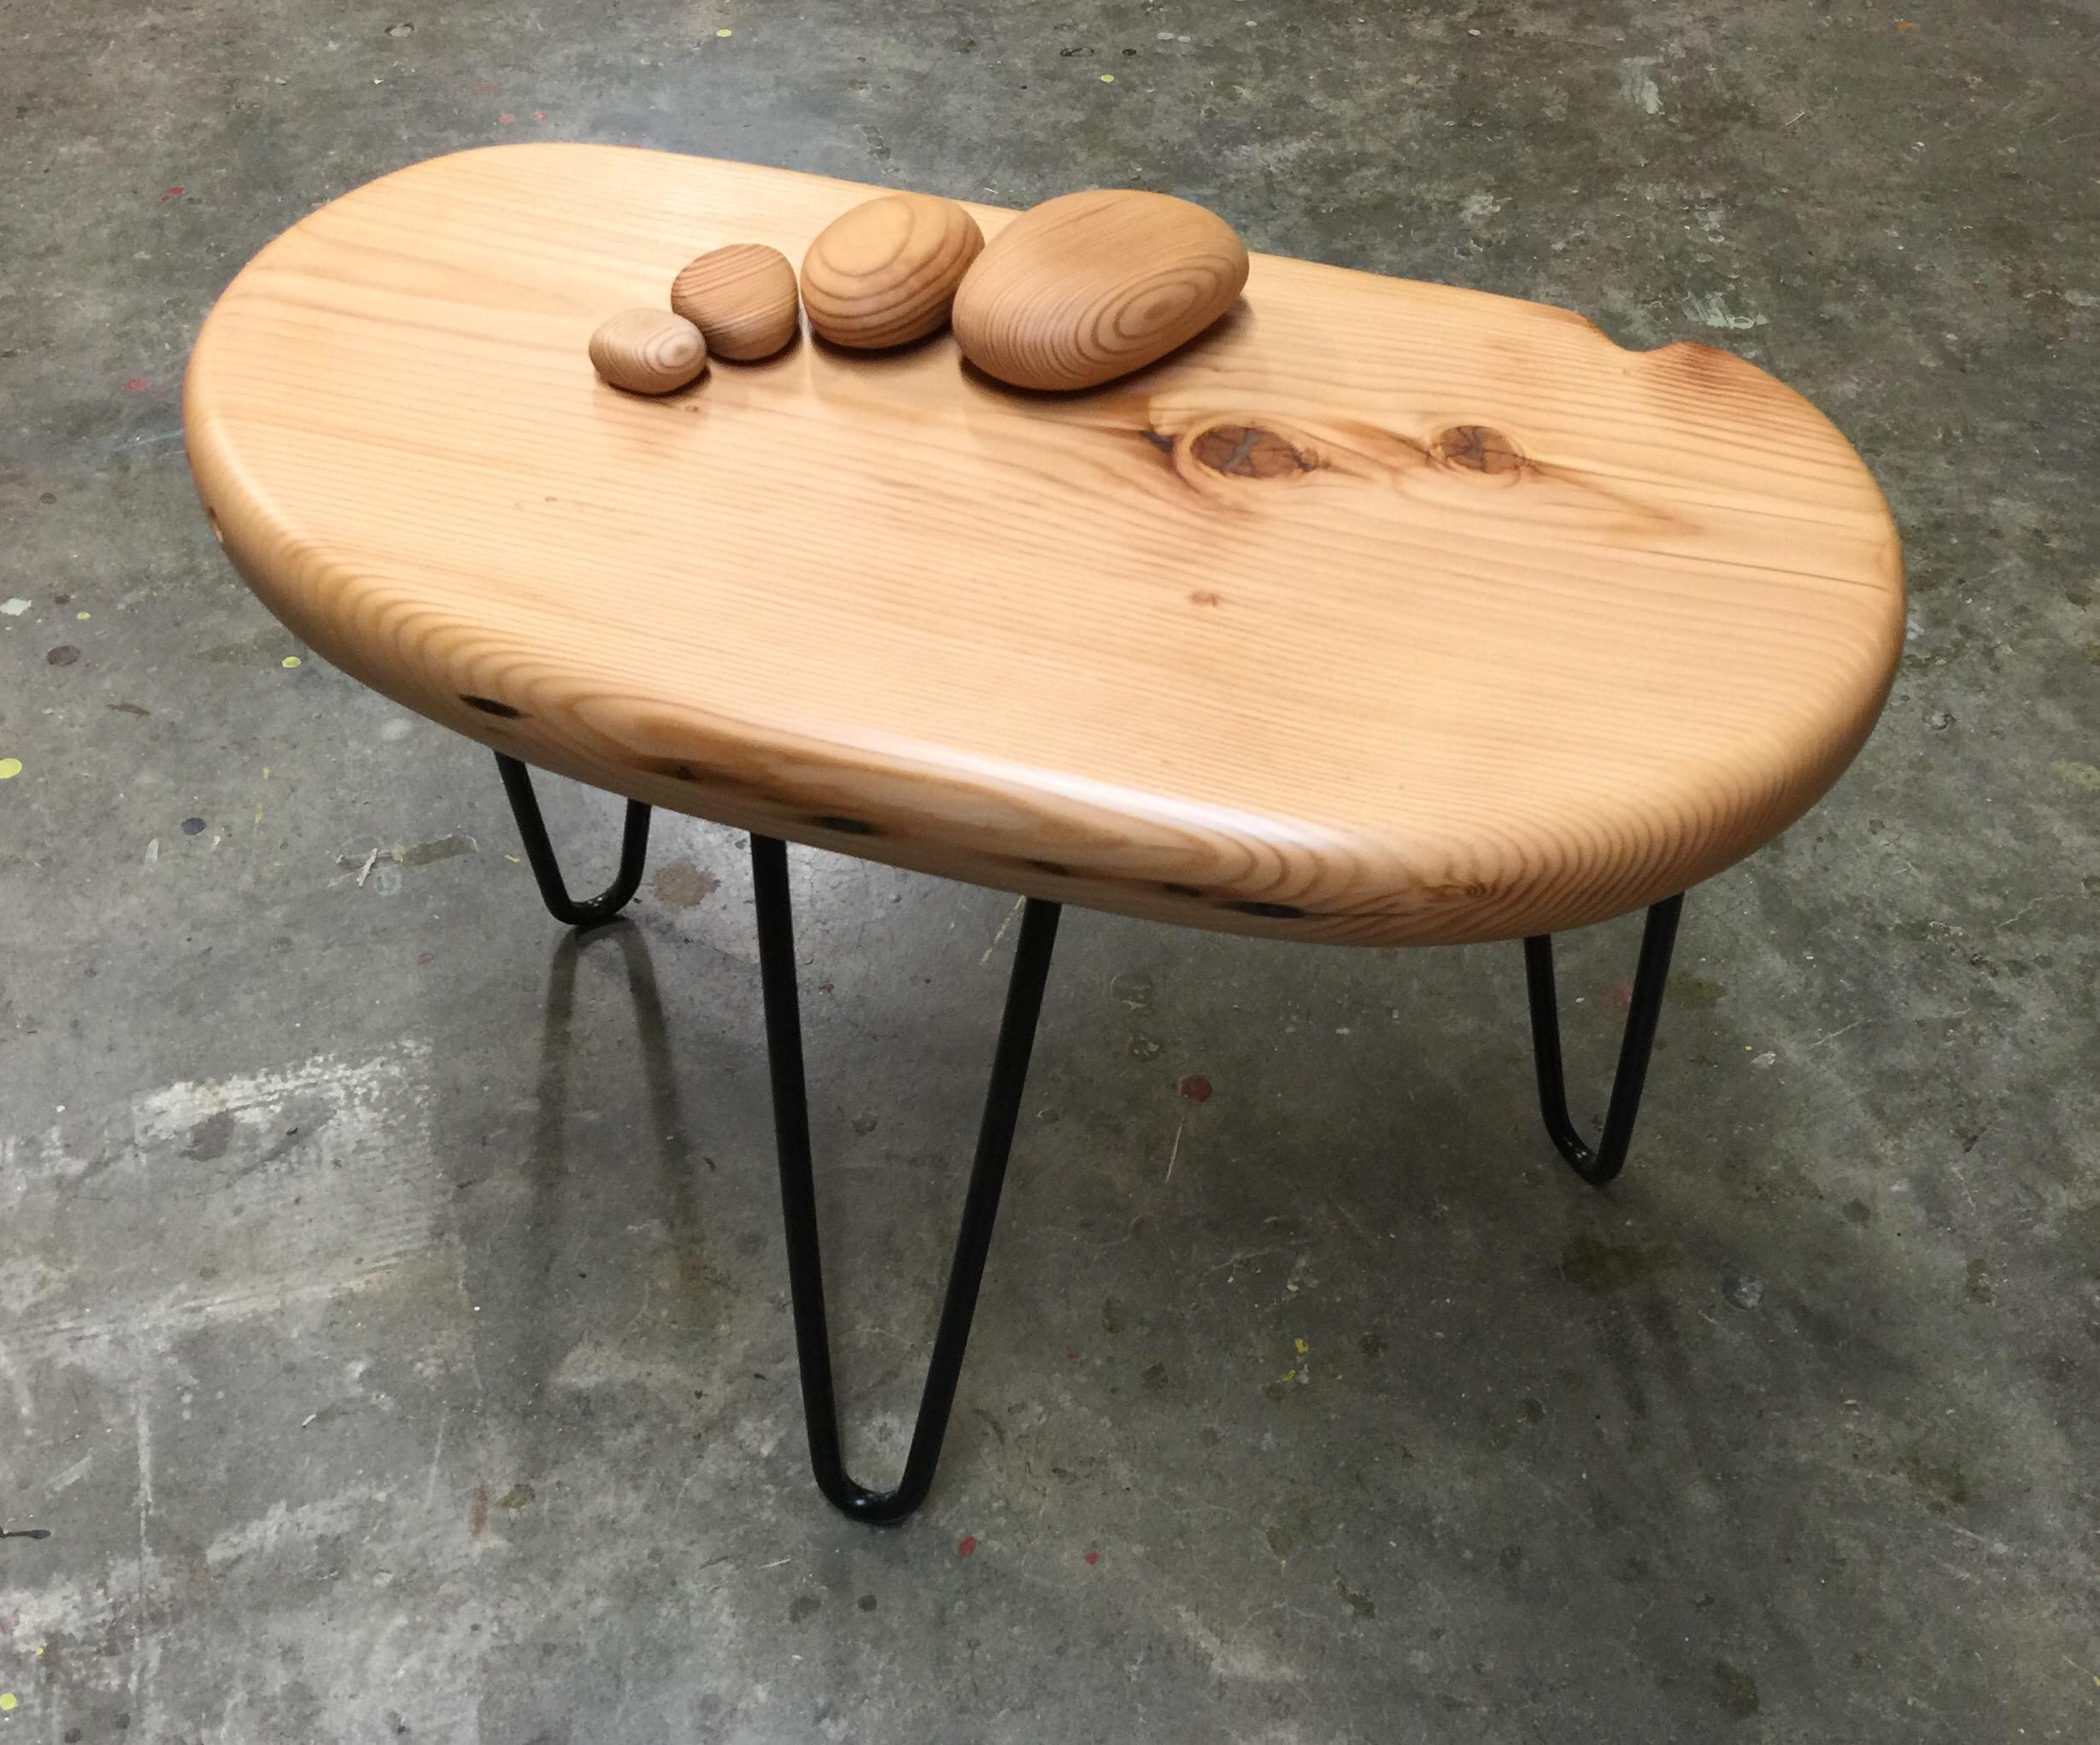 Genial Side Table With Four Rocks 24w X 12d X 18h $300